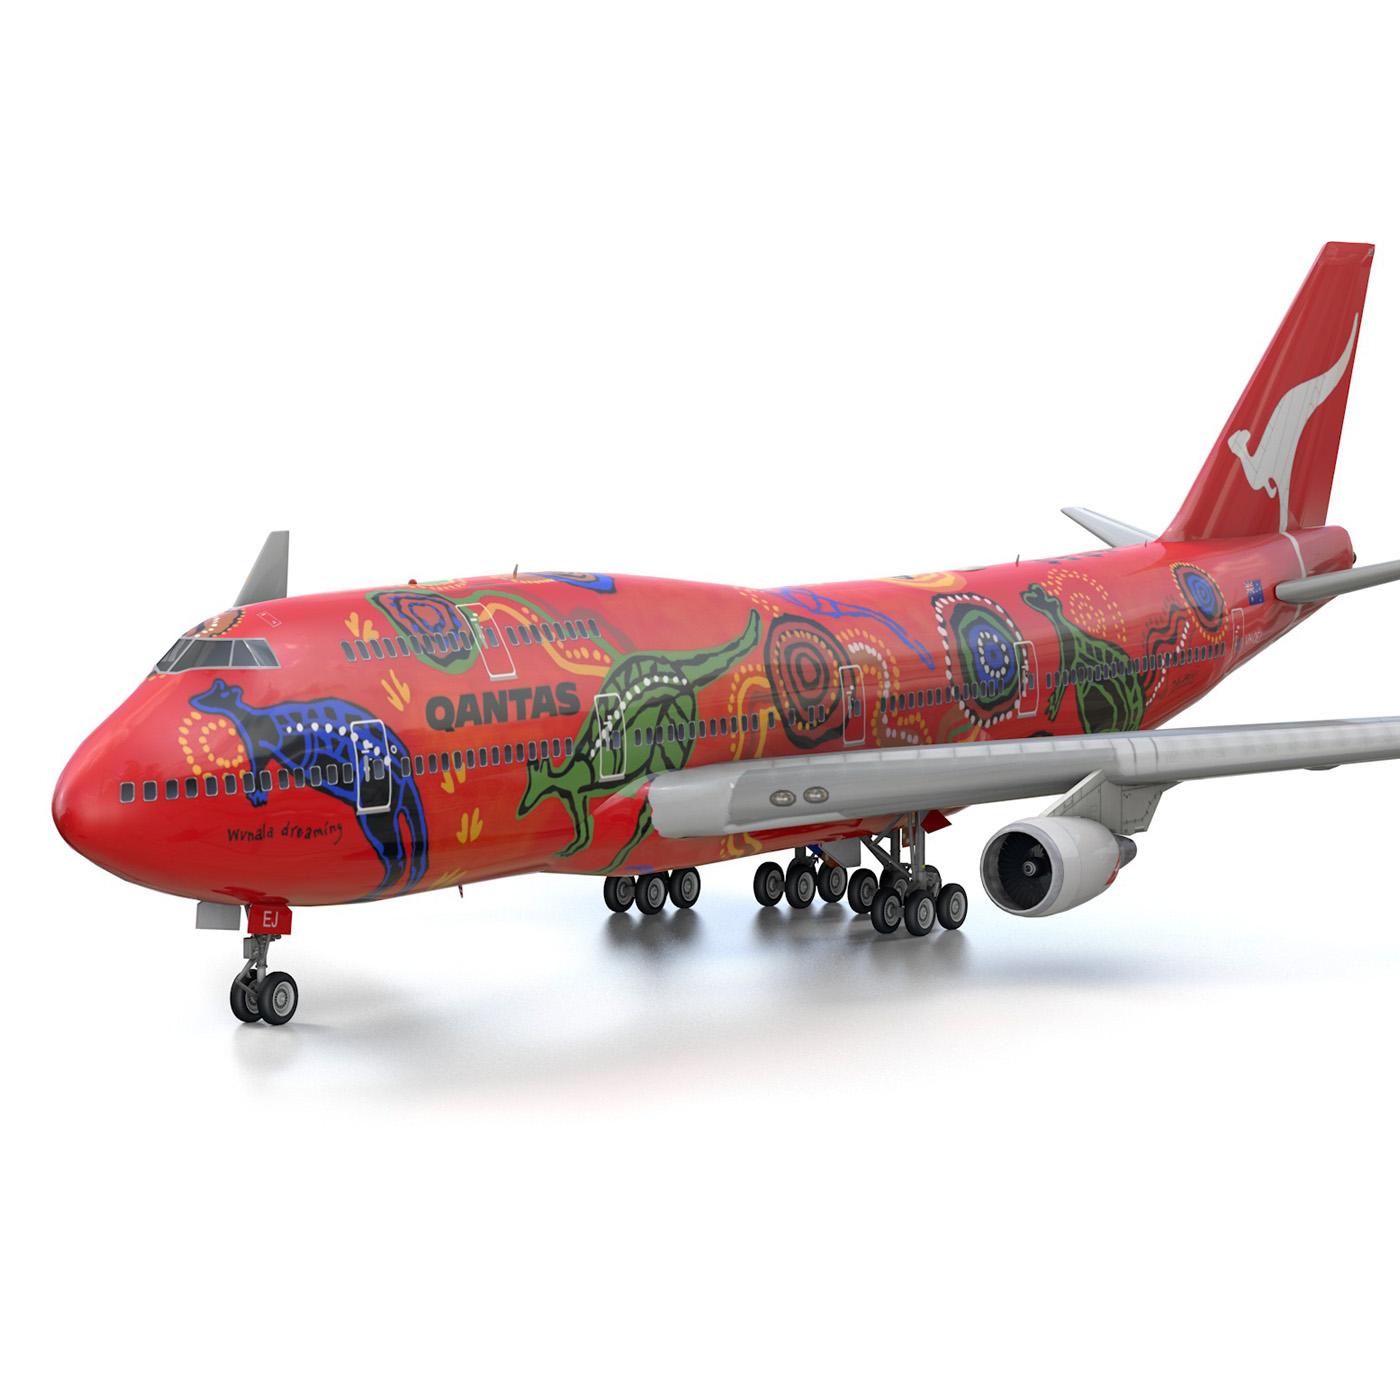 boeing 747 qantas wunala dreaming 3d model 3ds fbx c4d lwo obj 281787